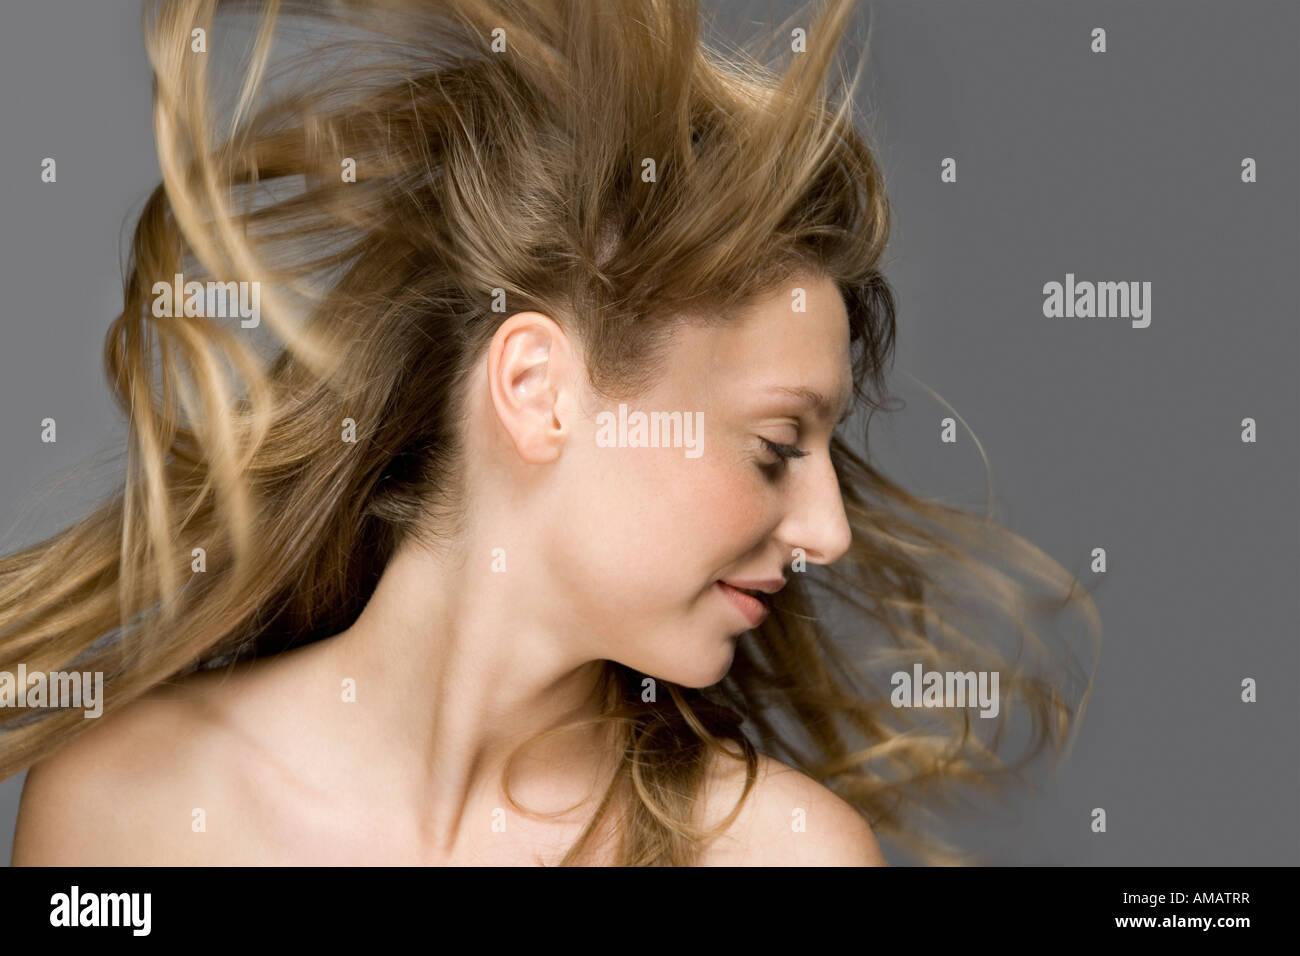 Air blowing through a fashion model's hair - Stock Image